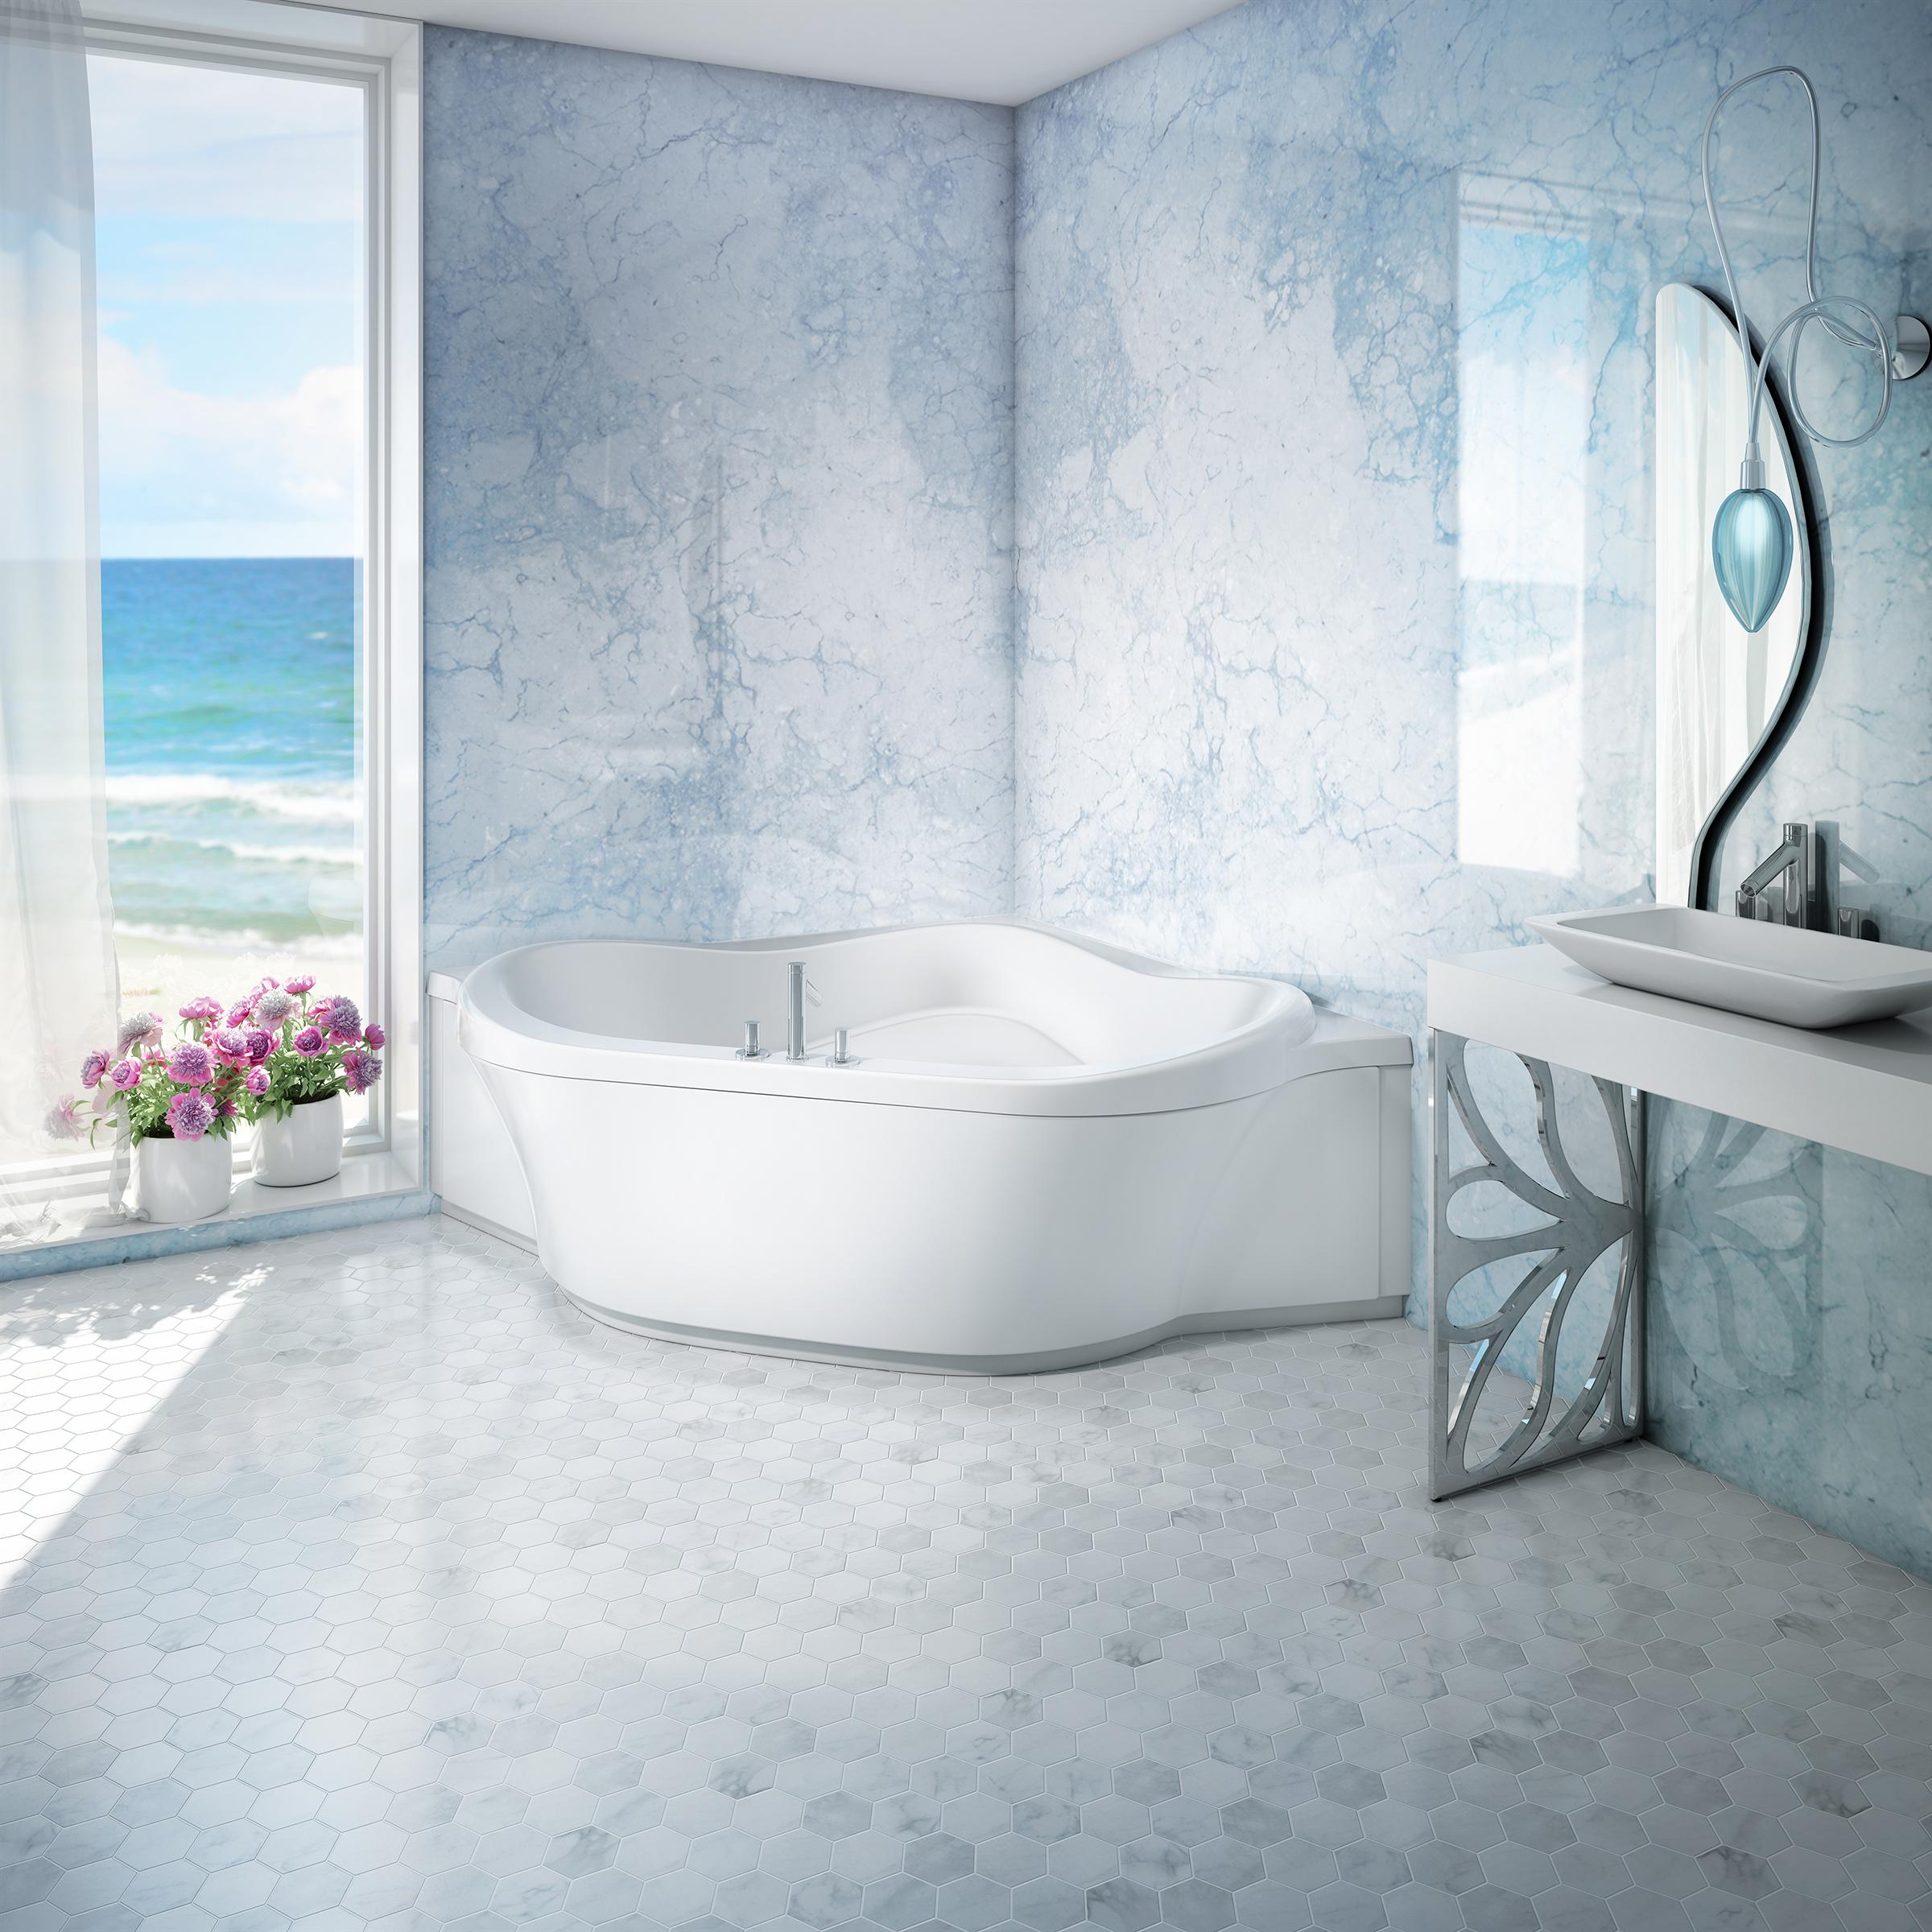 Bain Ultra Elegant Amma Therapeutic Baths